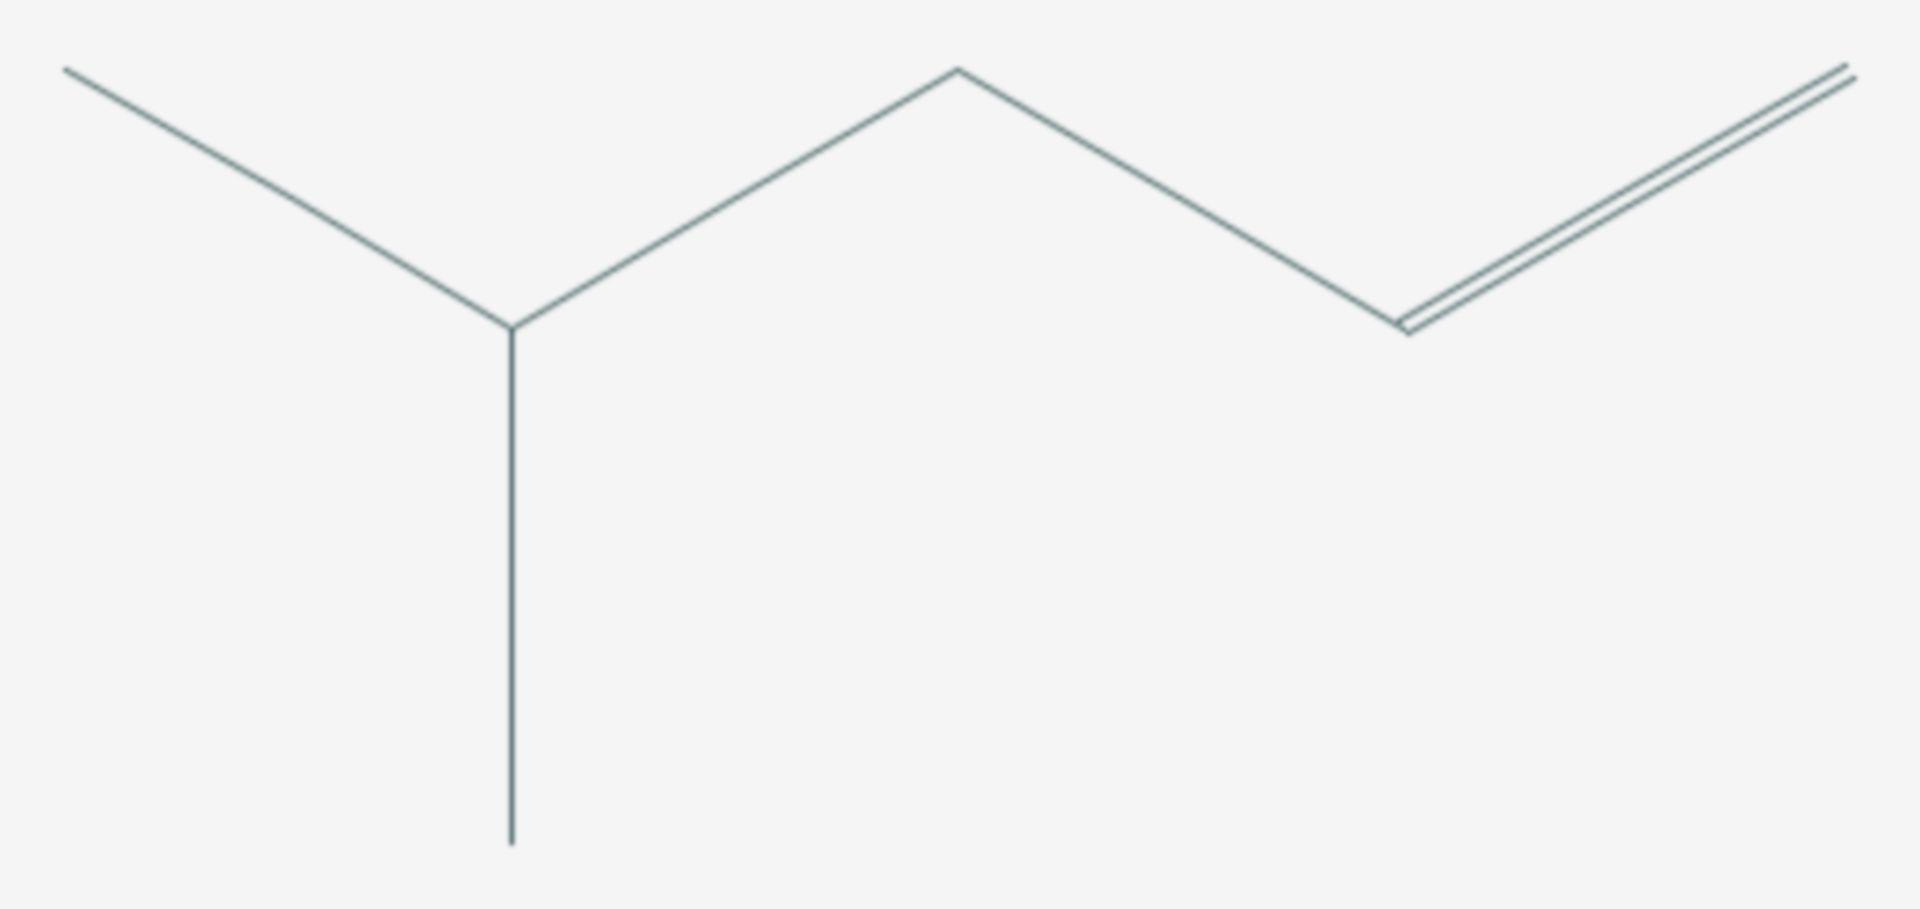 4-Methyl-1-penten (Strukturformel)